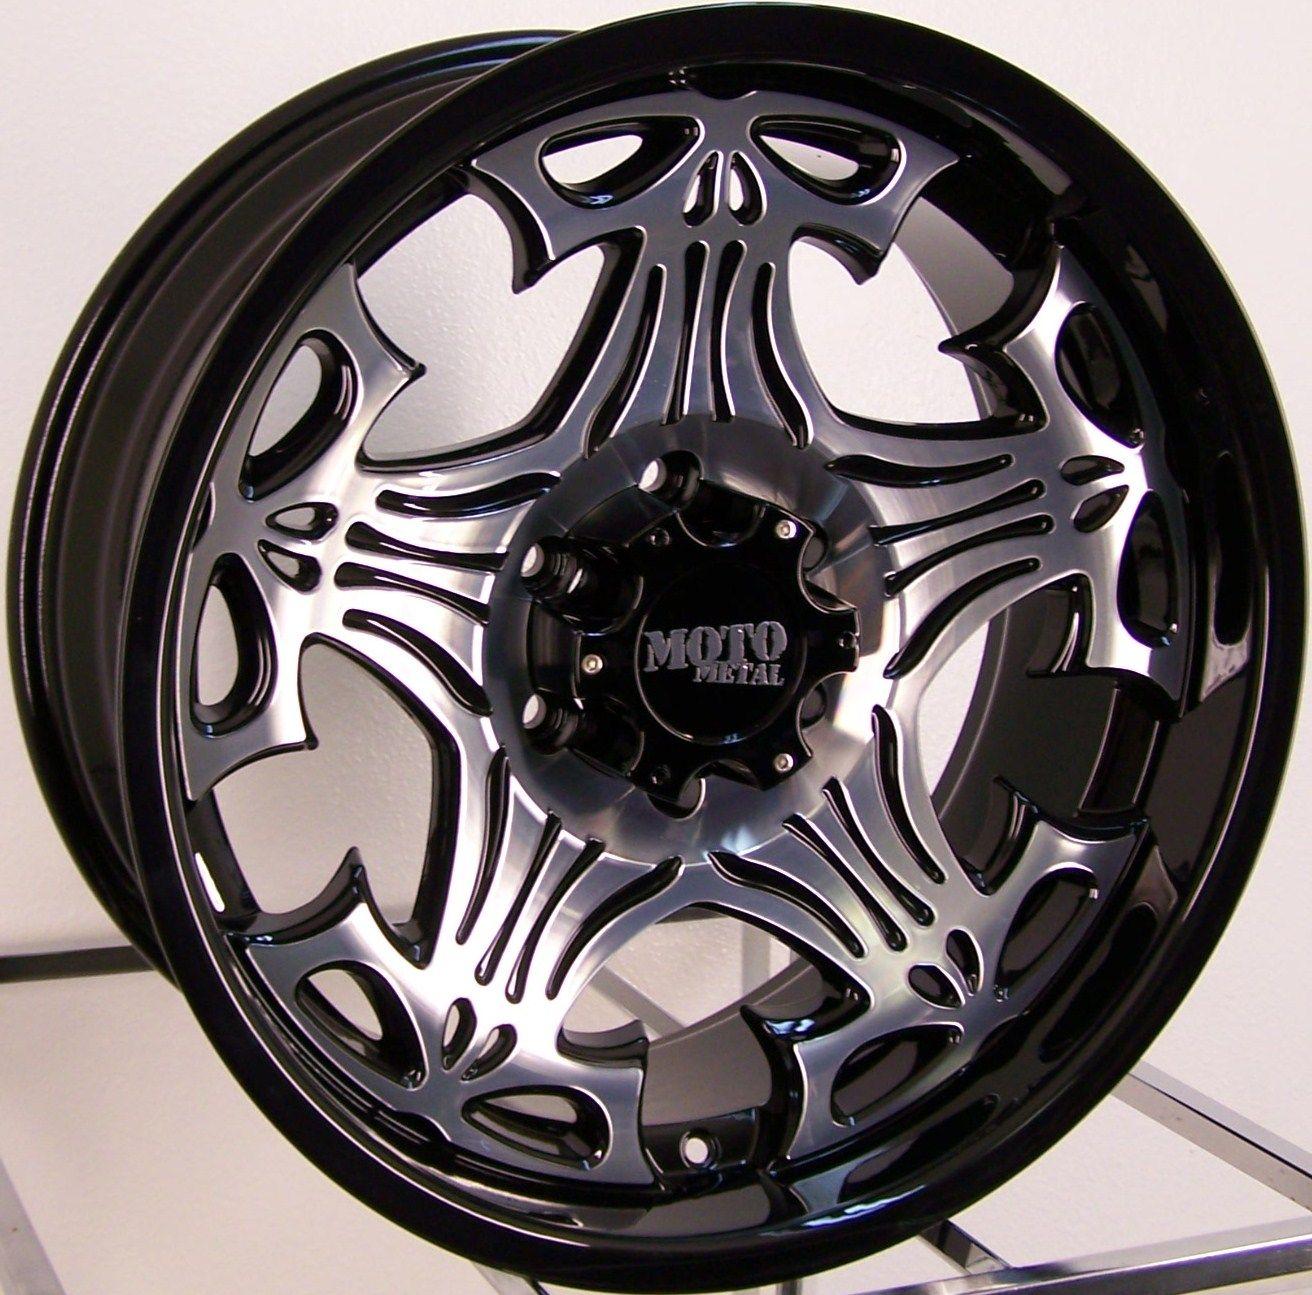 20 Skull Wheels Rim Chevy Dodge Ford 2500 3500 HD 8LUG